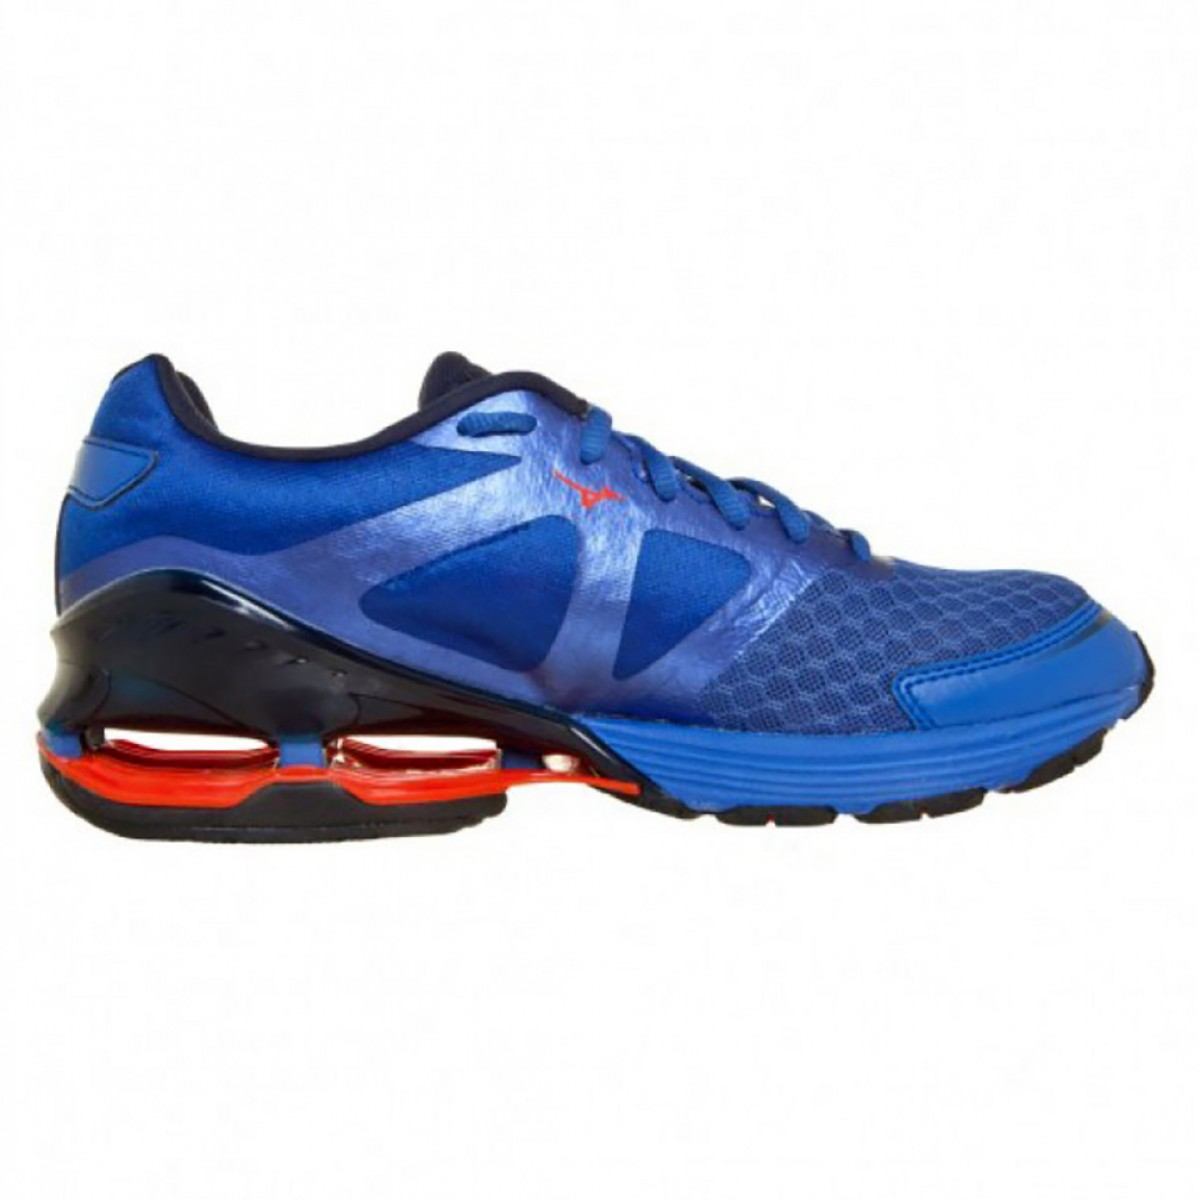 Tênis Mizuno Wave Frontier 8 Masculino Azul e Laranja - Compre Agora ... cb5422c3da8